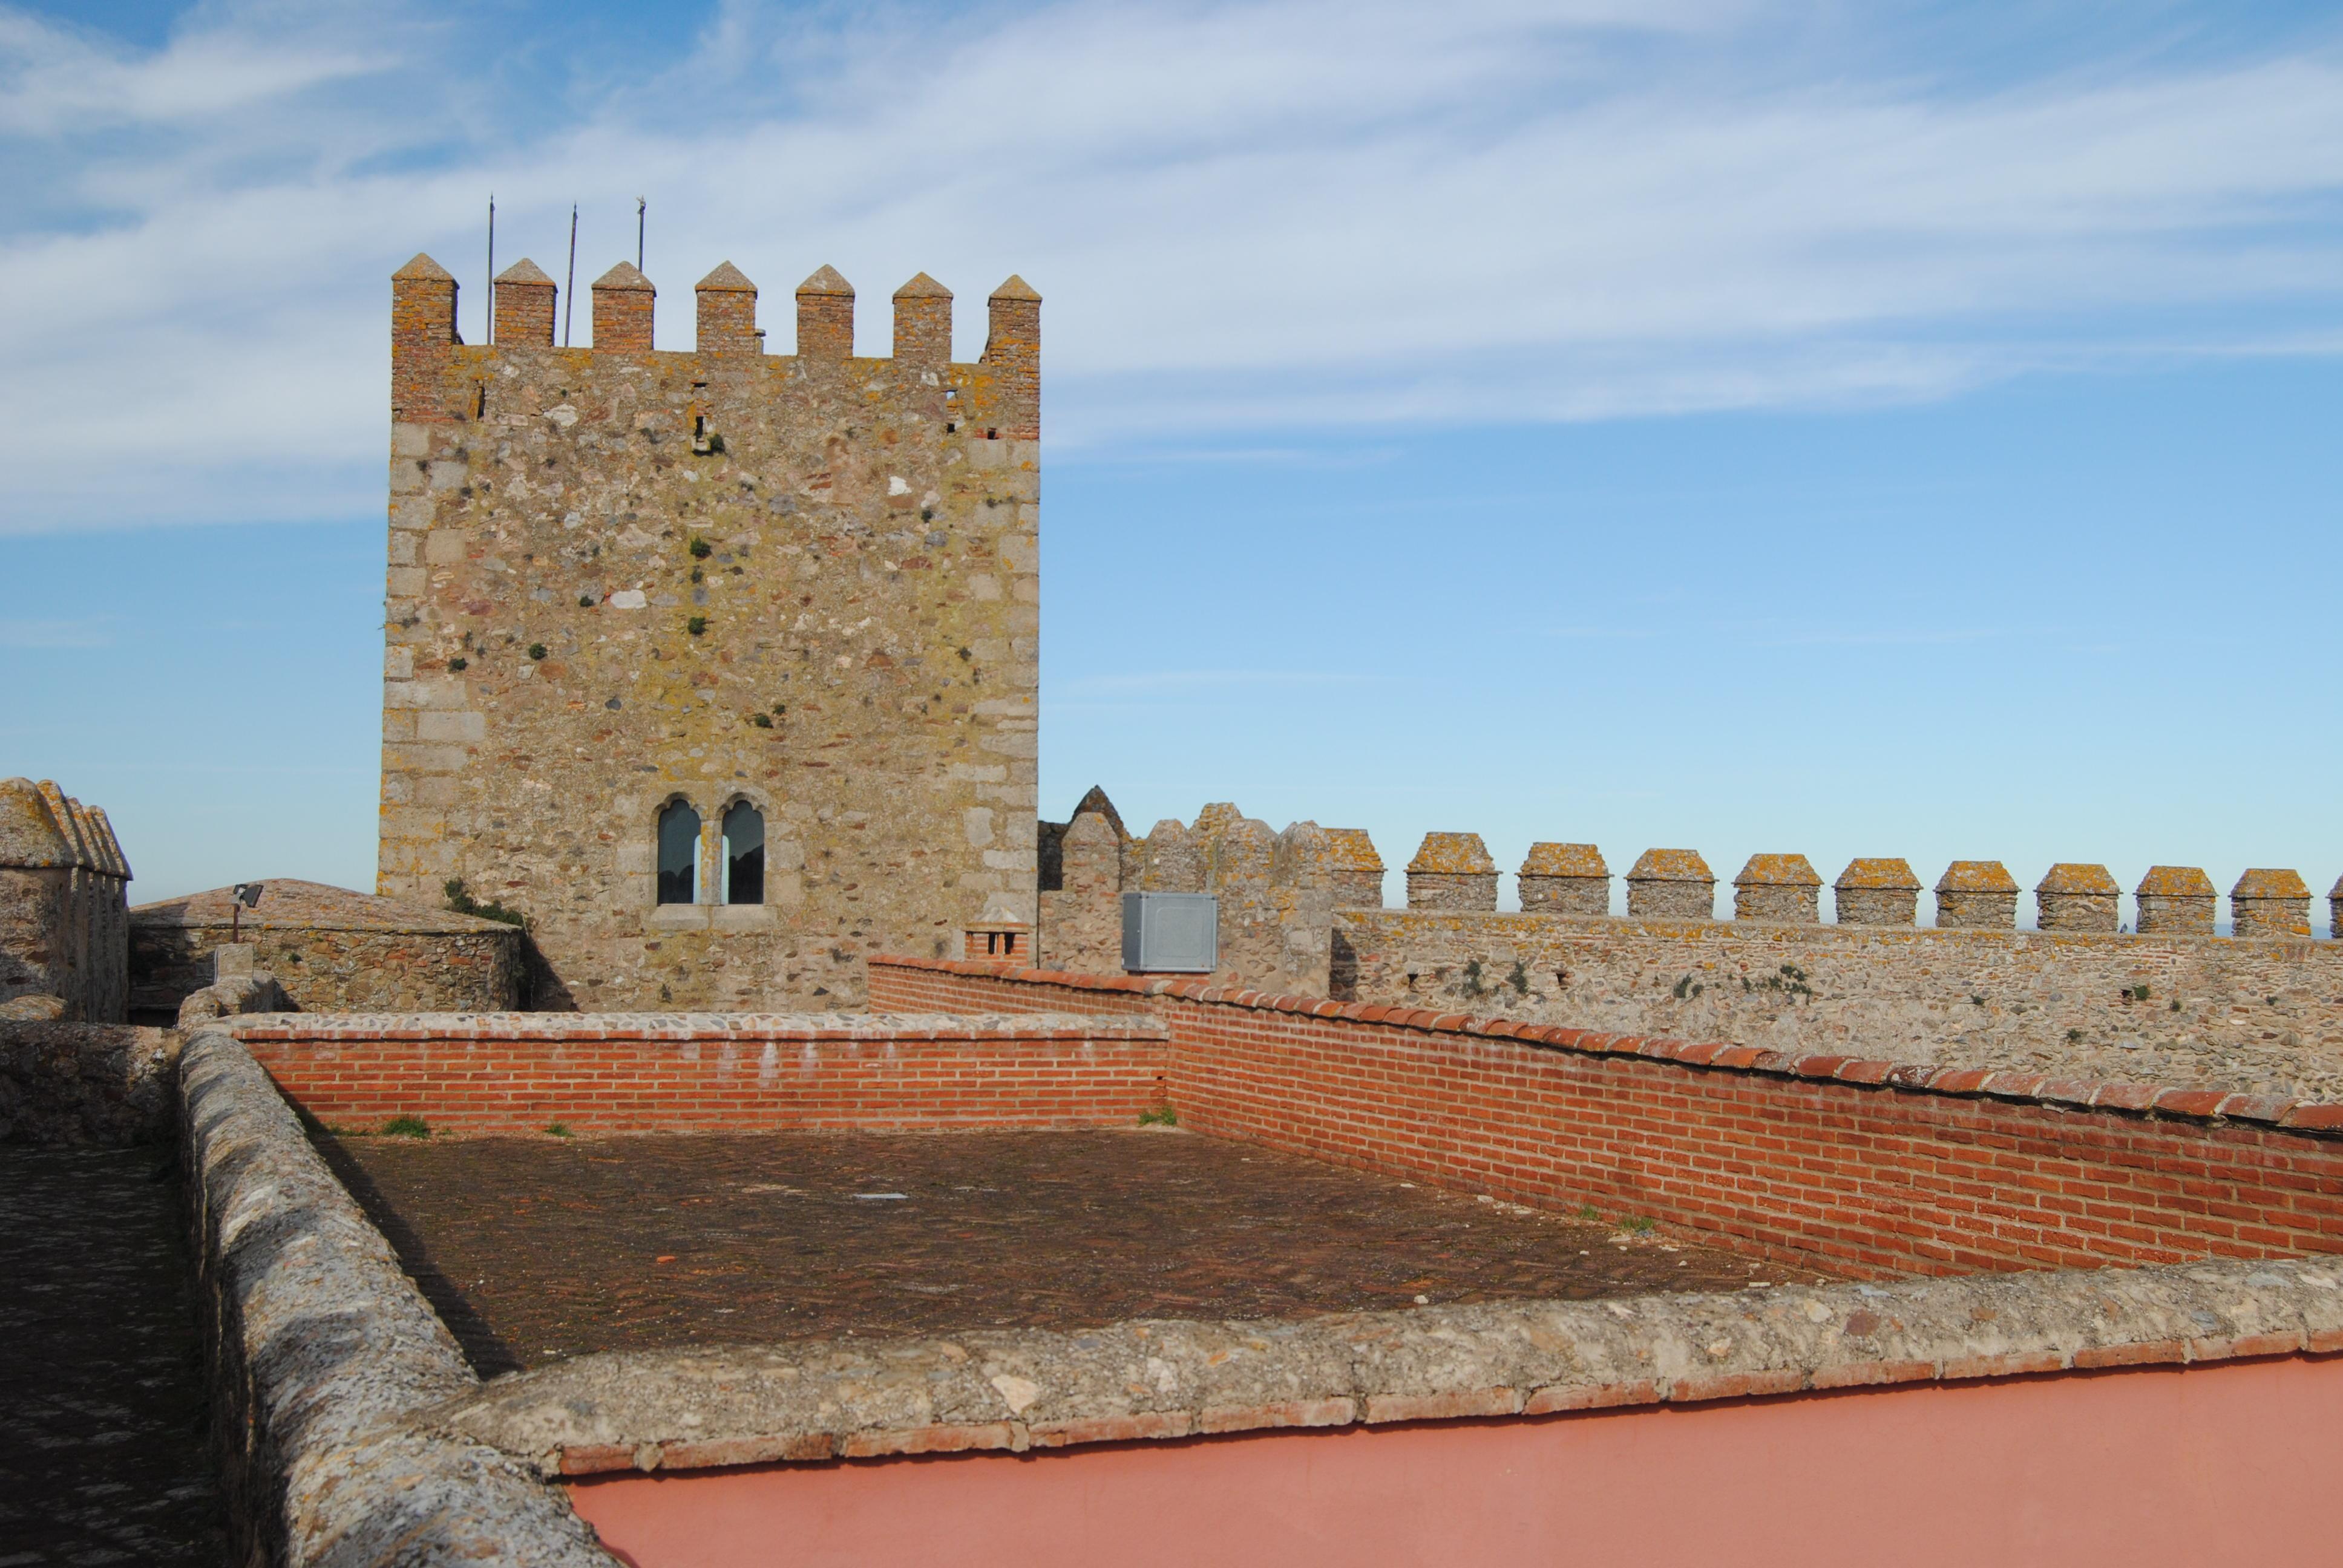 File:Castillo de Segura de León (15894201180).jpg - Wikimedia Commons